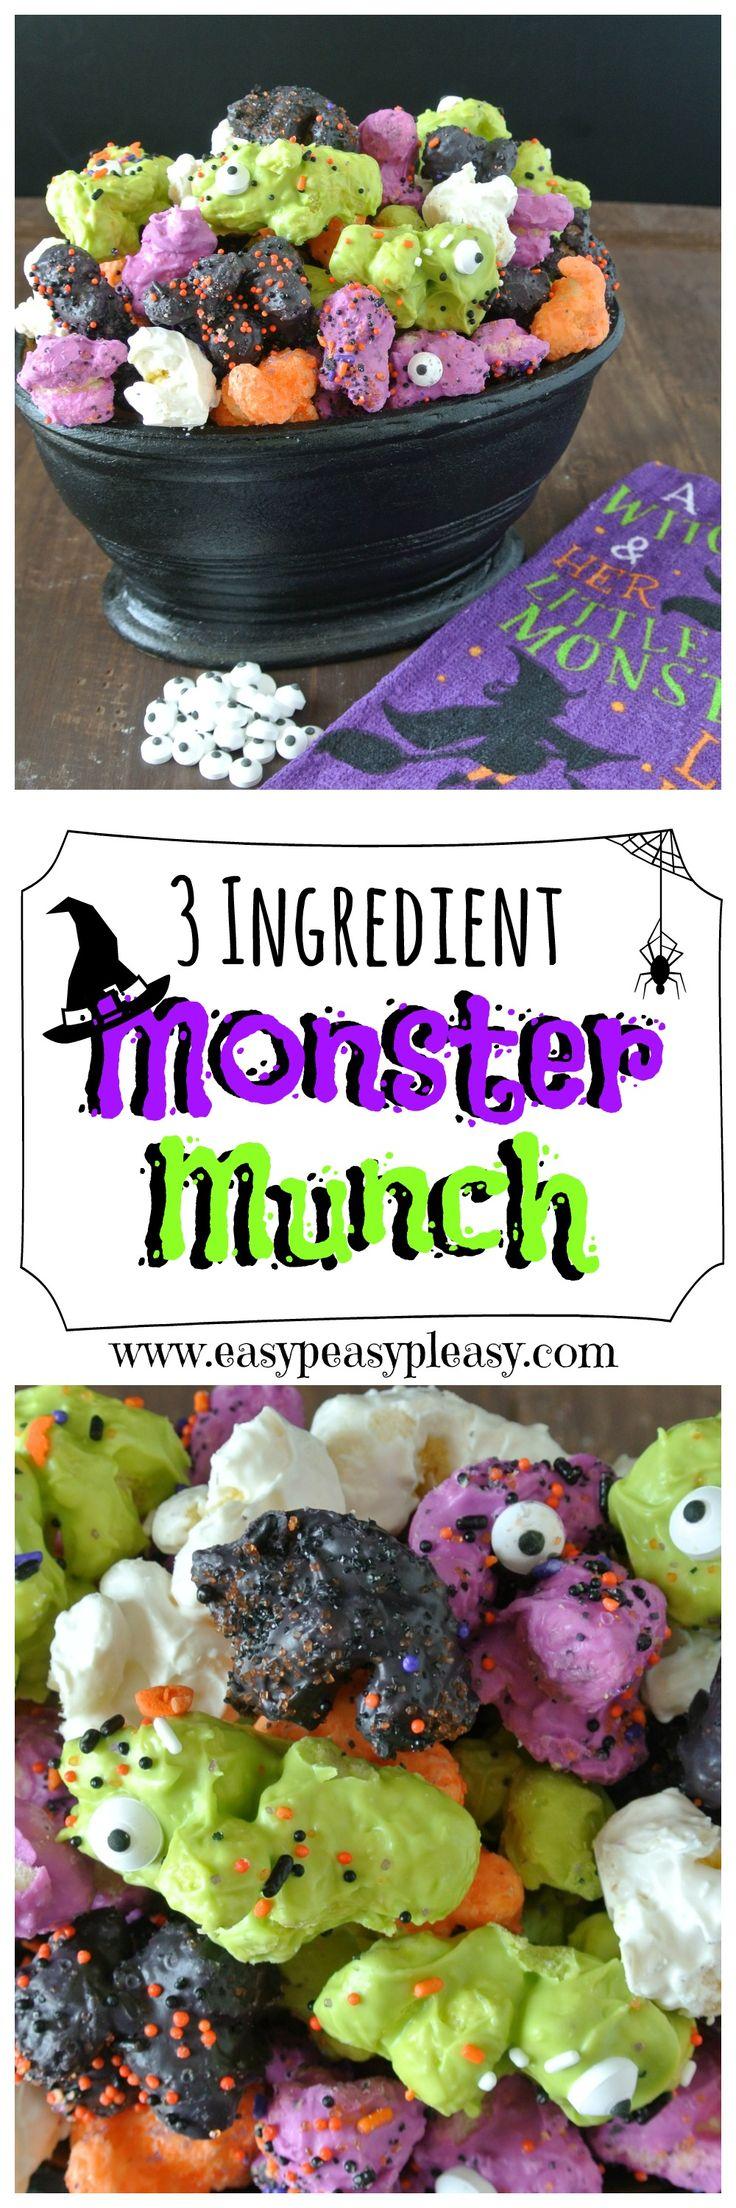 No popcorn here...3 Ingredient Monster Munch is the perfect Halloween Treat!